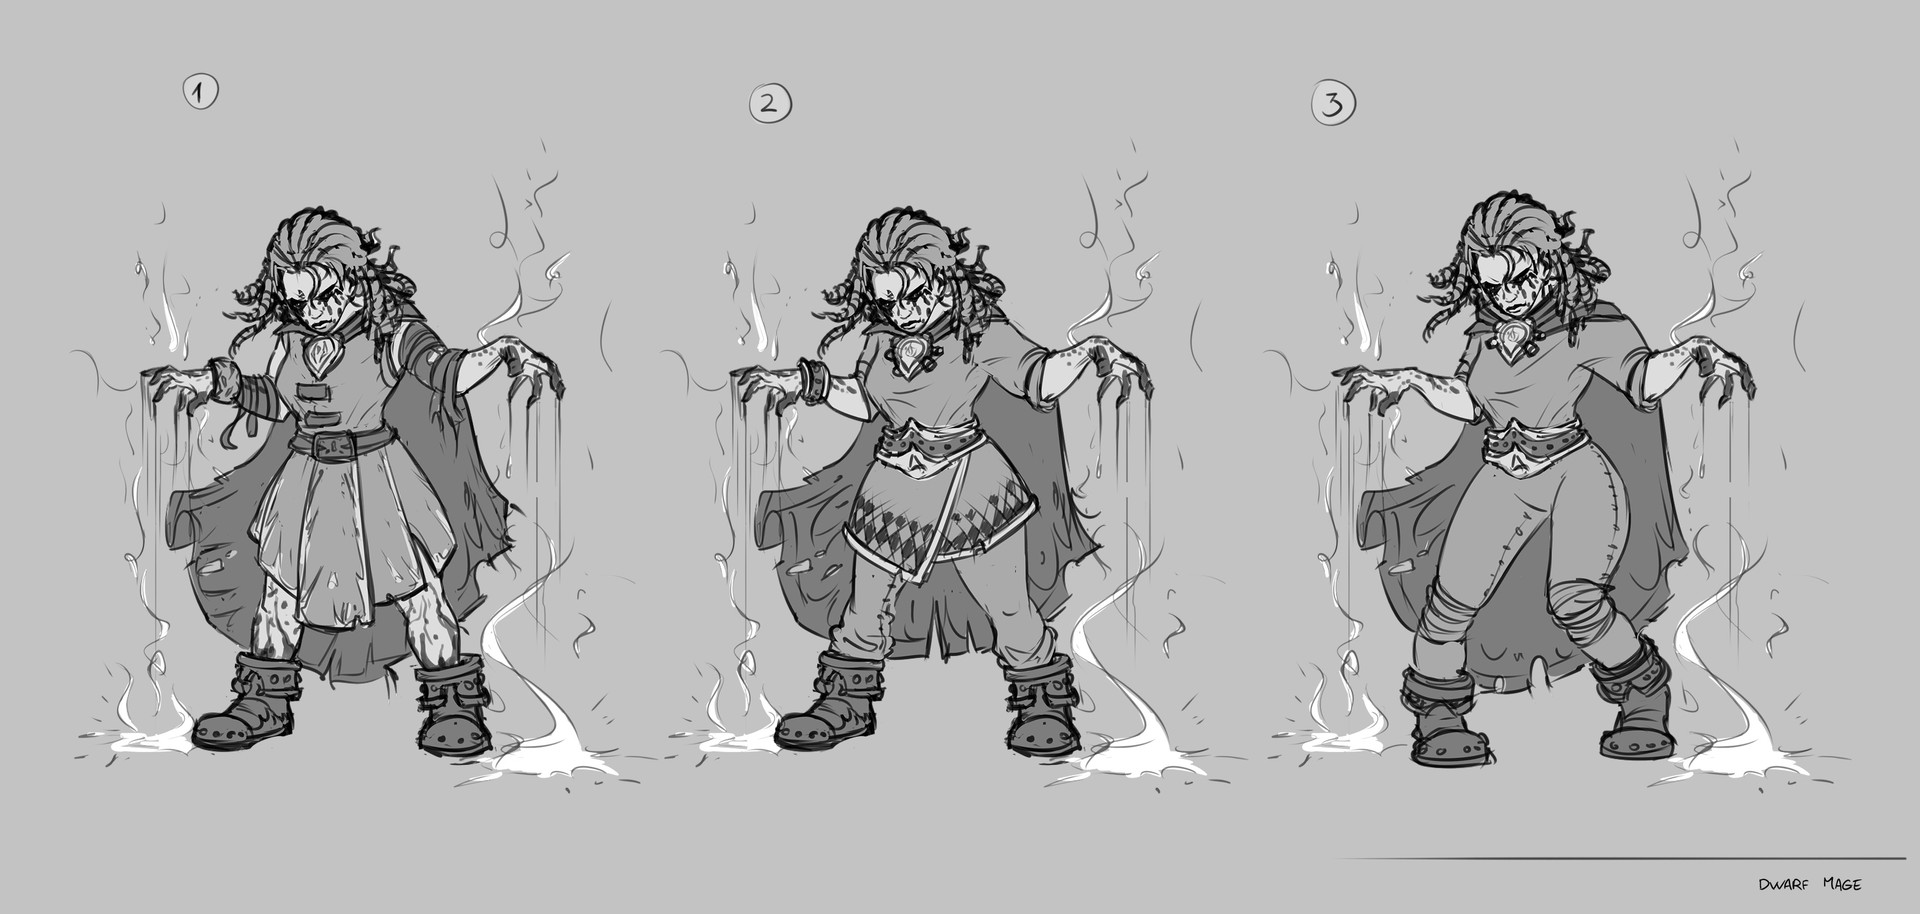 Jonas petrauskas dwarf daryaredgold sketch2